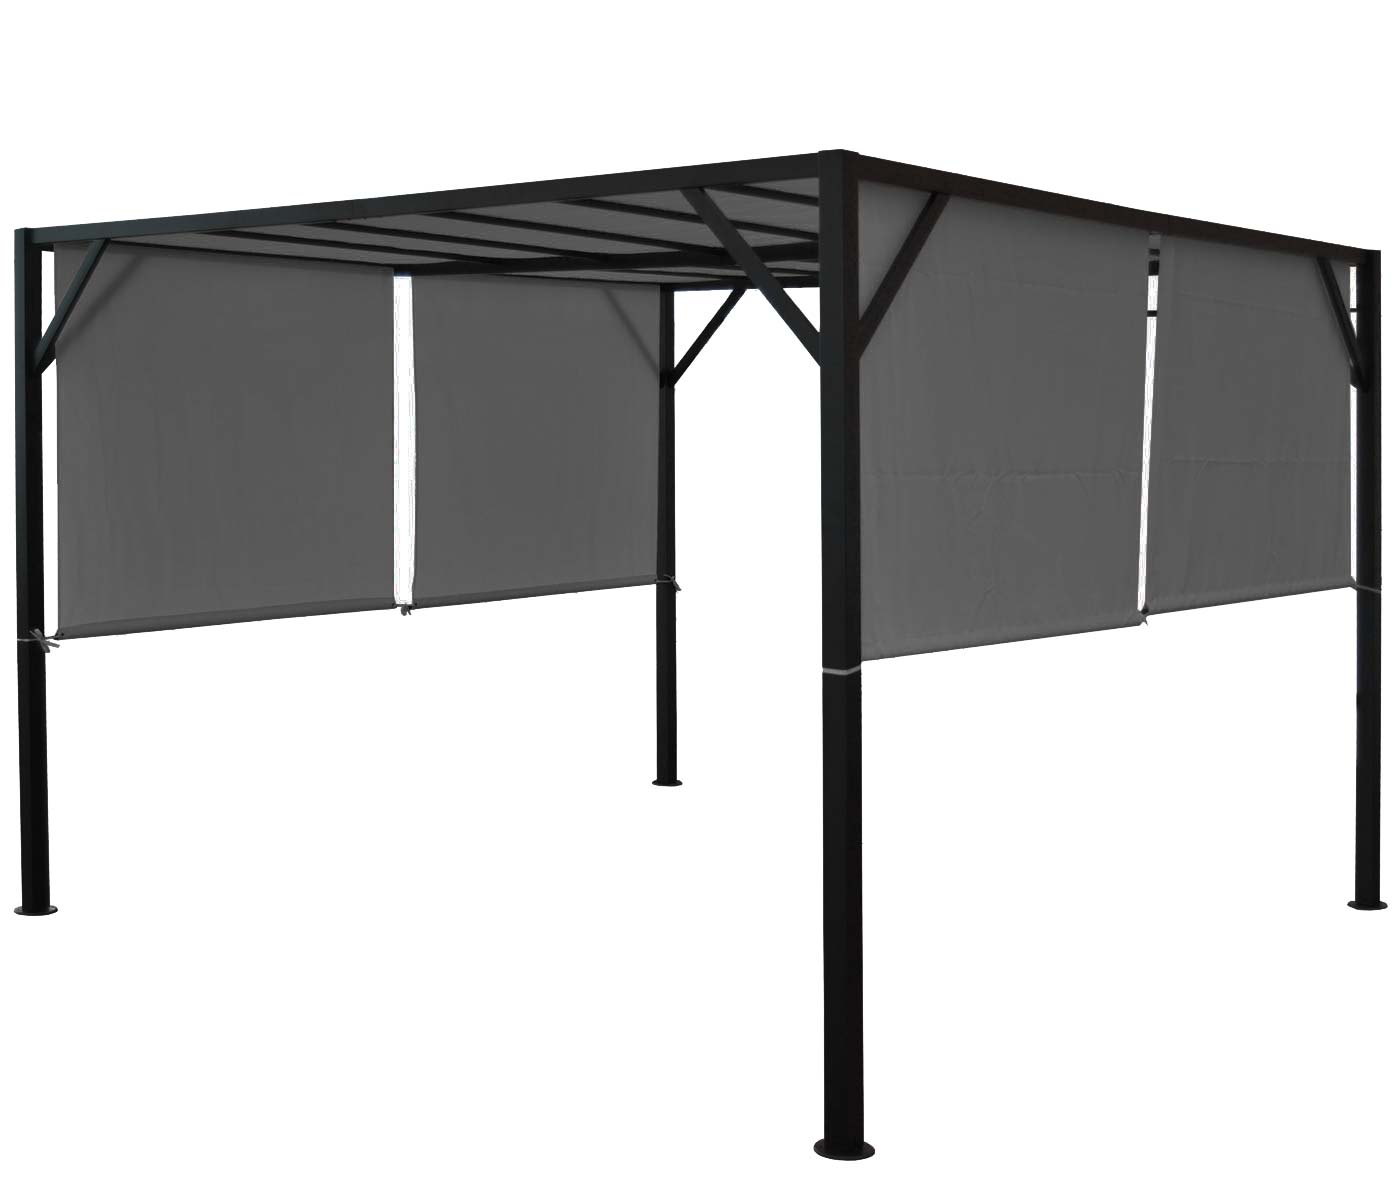 Pergola Baia, Garten Pavillon Terrassenüberdachung, stabiles 6cm-Stahl-Gestell + Schiebedach grau ~ 4x4m